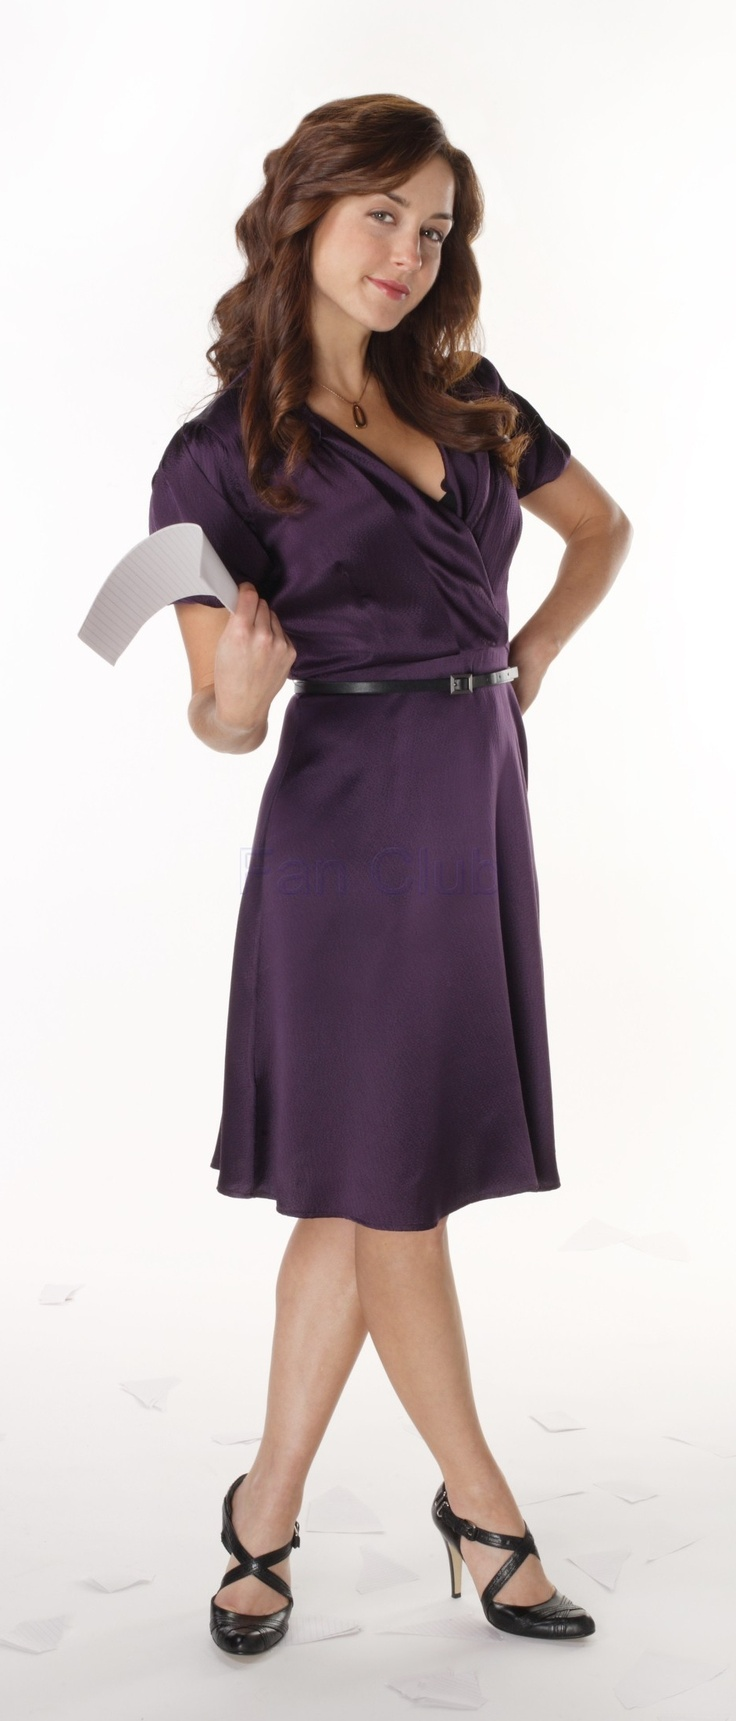 Vestido roxo - Erin Karpluk - Being Erica